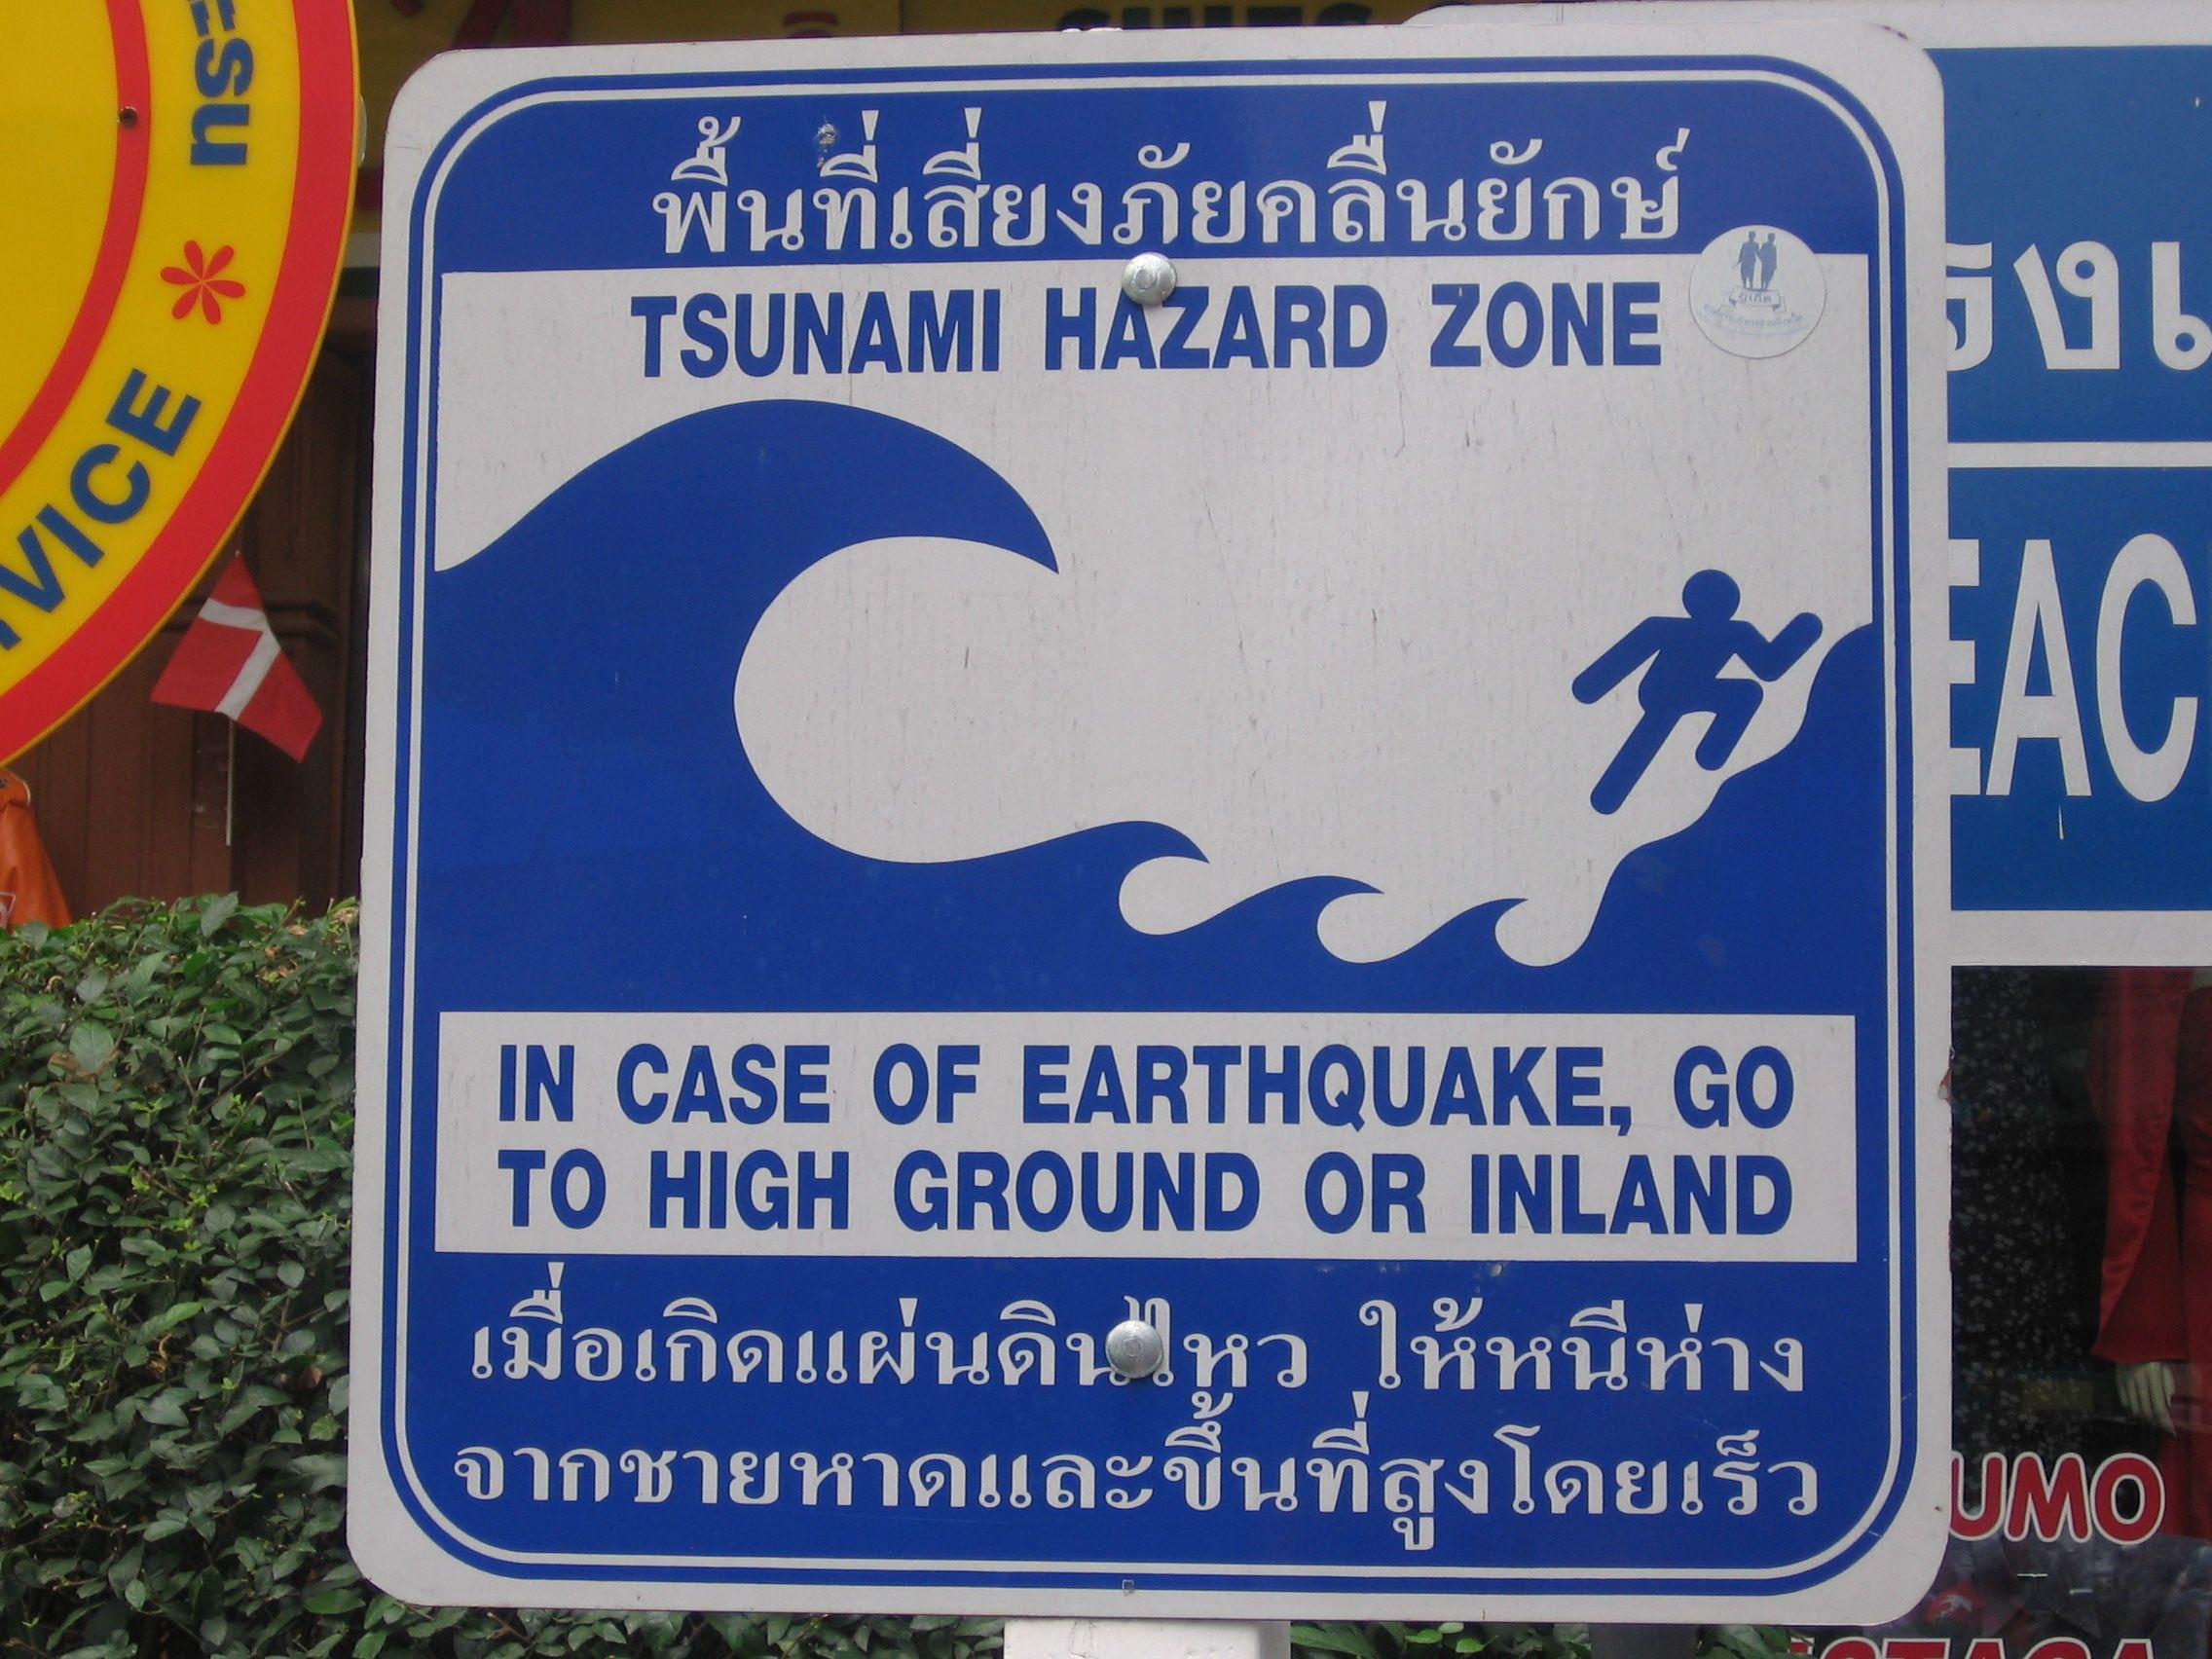 Phuket Thailand | History | Phuket, Phuket thailand, Tsunami